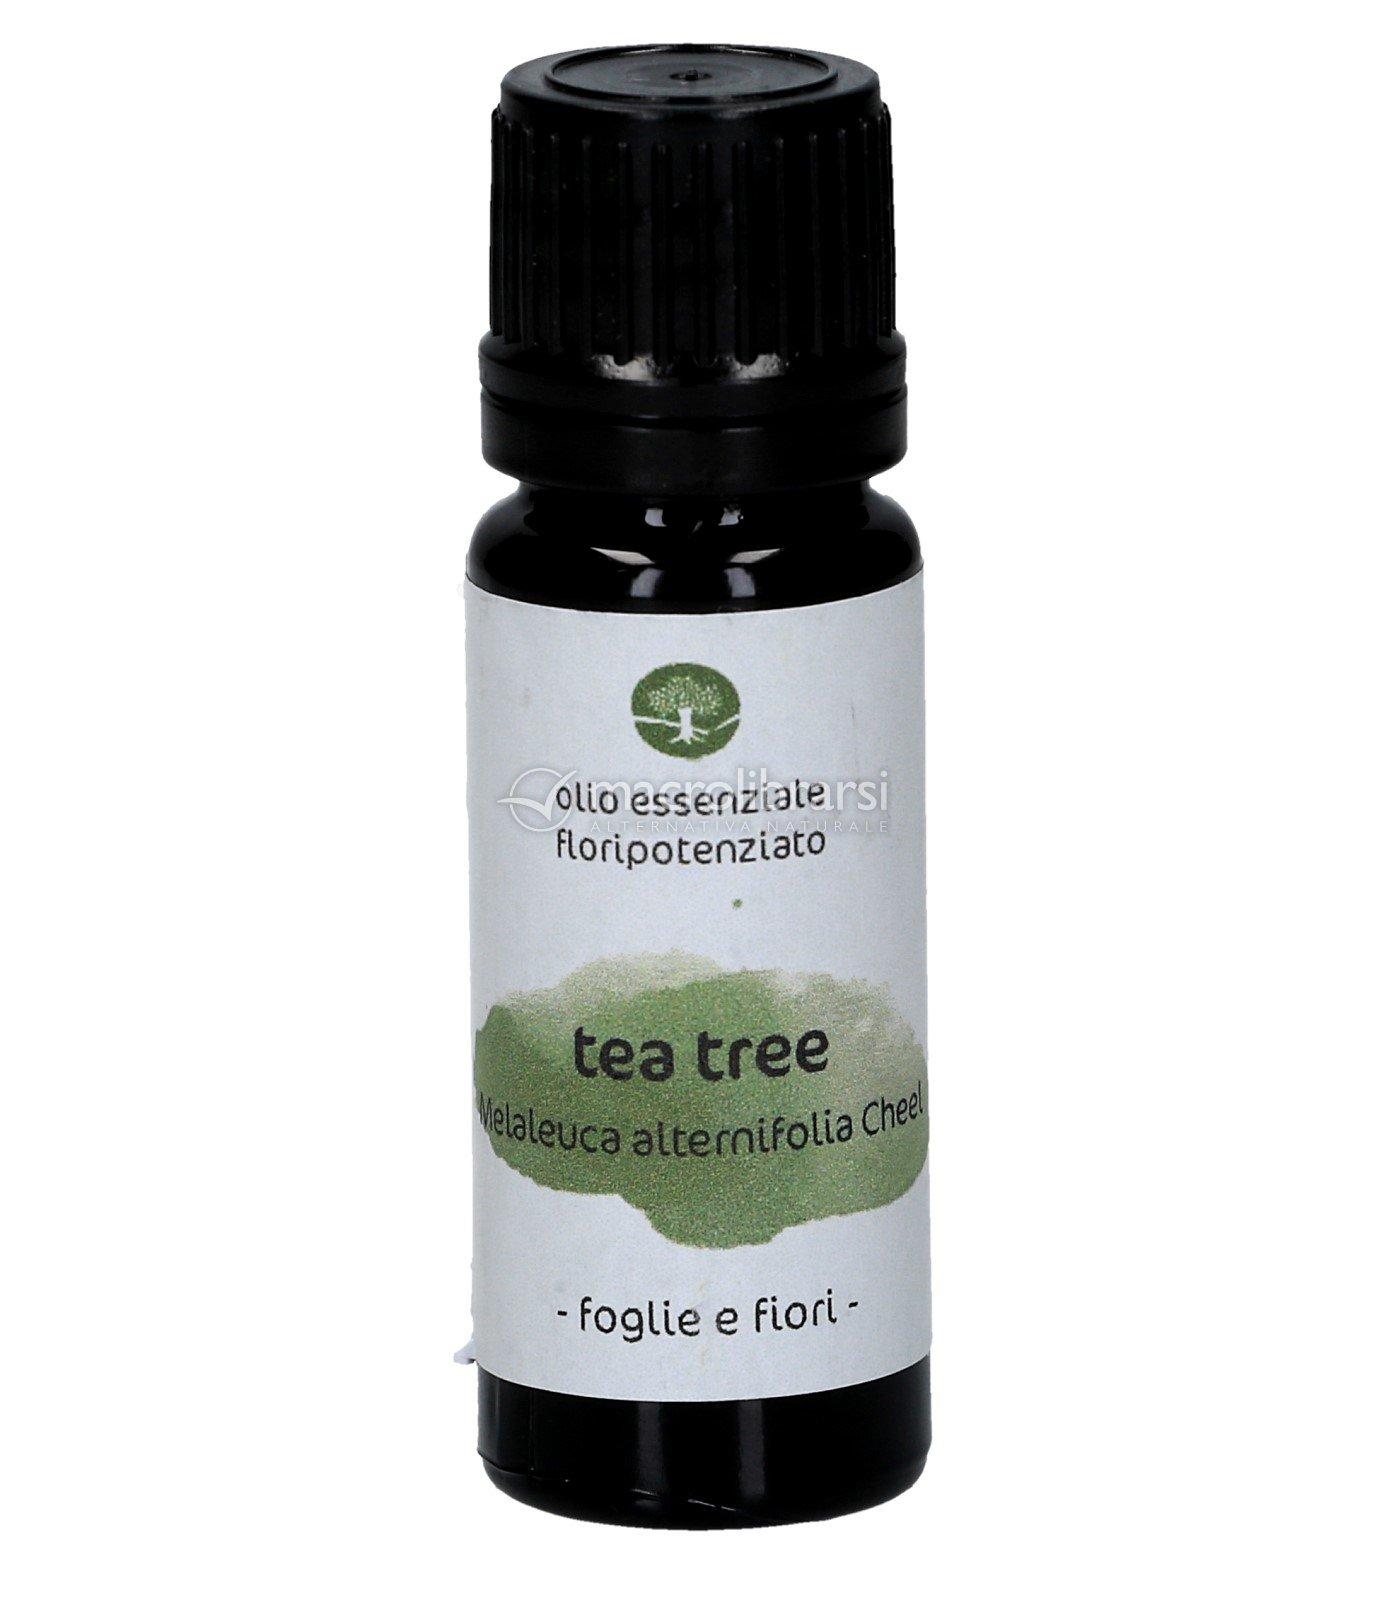 Tea Tree - Olio Essenziale Floripotenziato - 10 ml